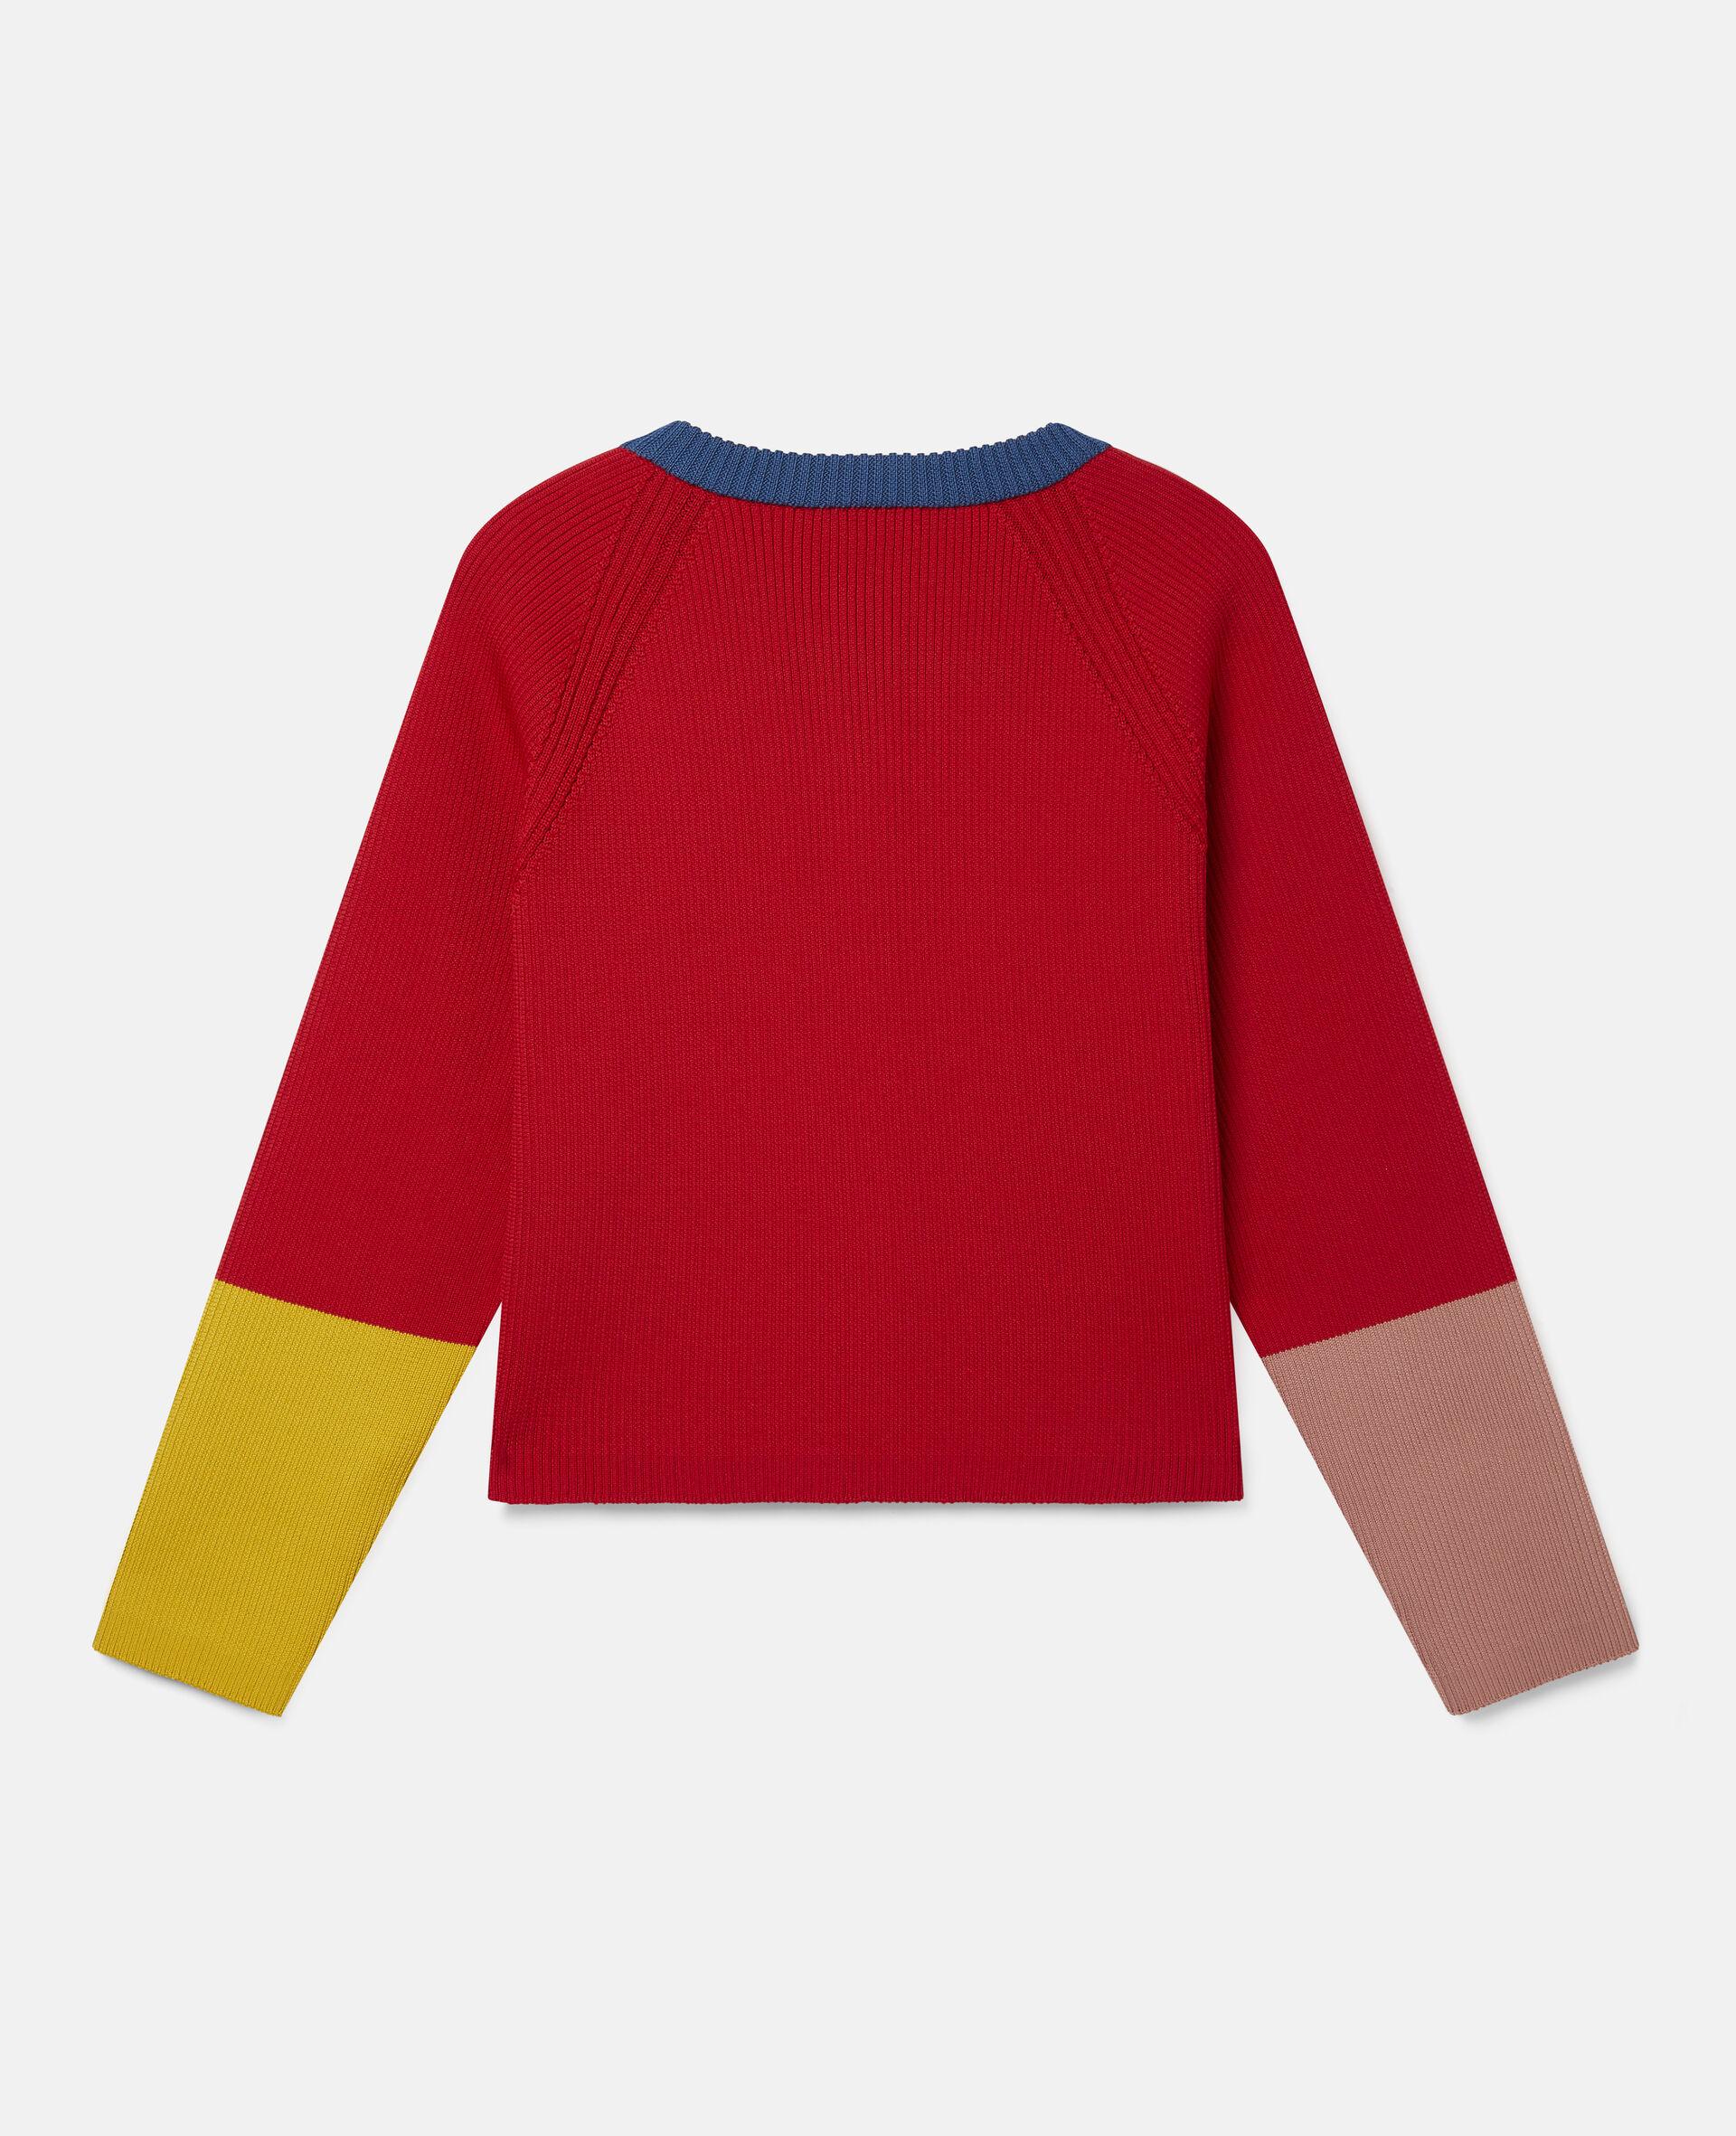 Colourblock Knit Rib Cardigan  -Red-large image number 3